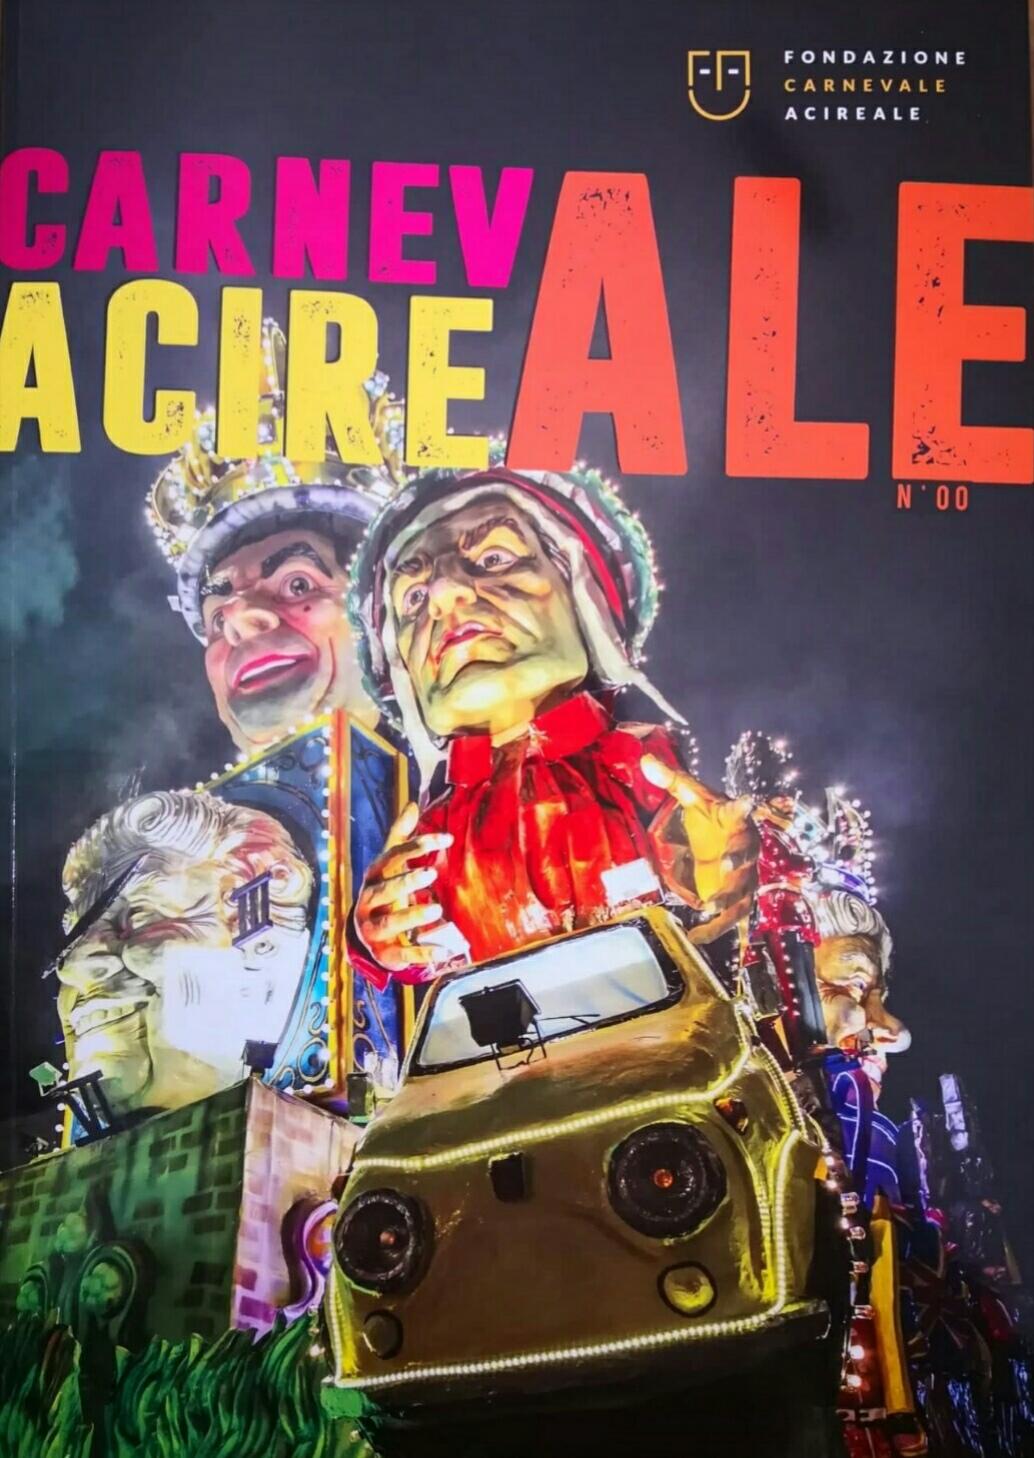 rivista_carnevale_acireale_2019_numero 0_1